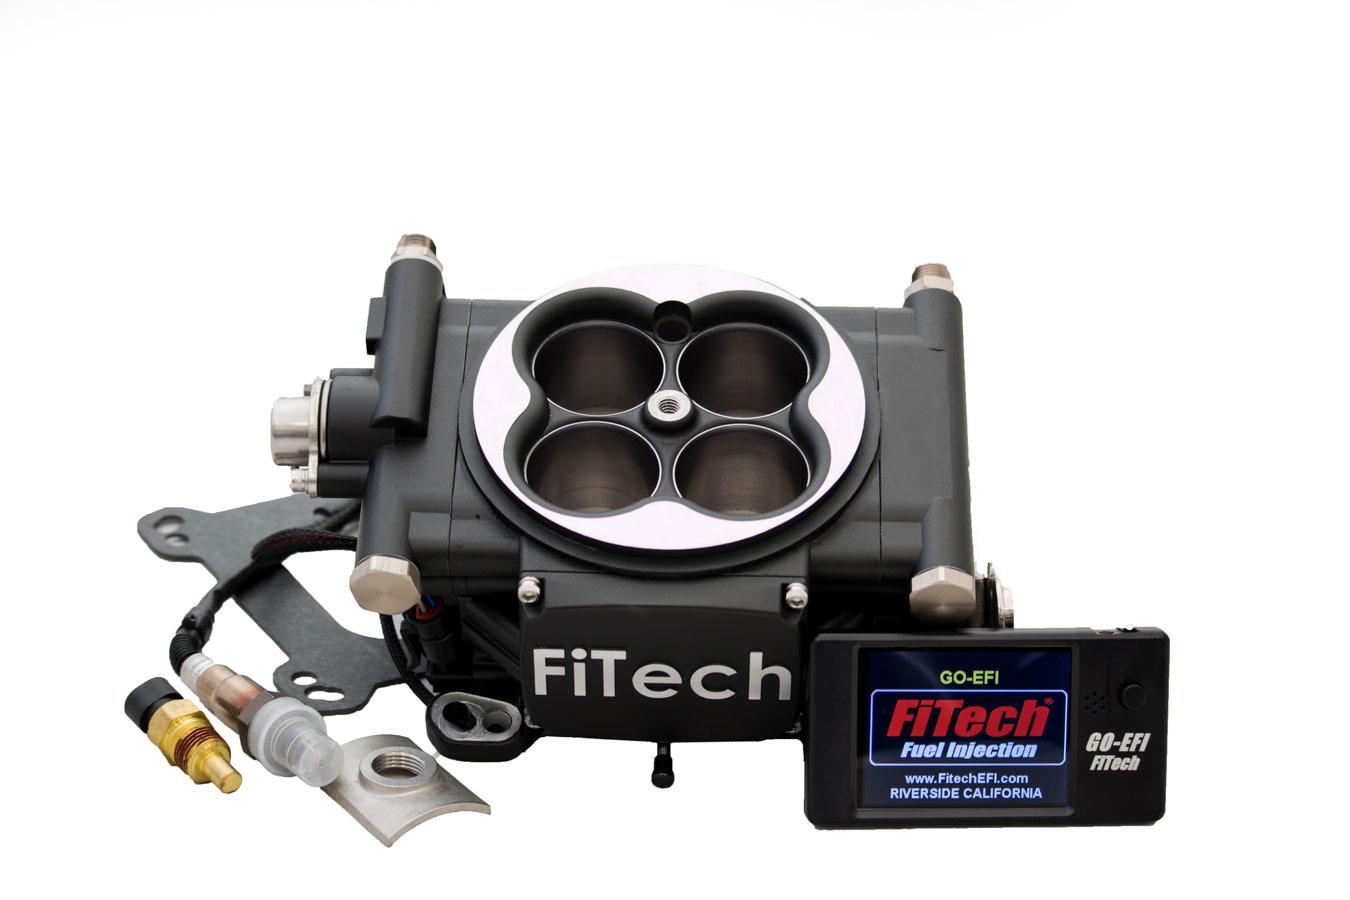 Fitech Fuel Injection 30002 Fuel Injection, Go EFI 4, Throttle Body, Square Bore, 70 lb/hr Injectors, Aluminum, Black Anodize, Universal, Kit